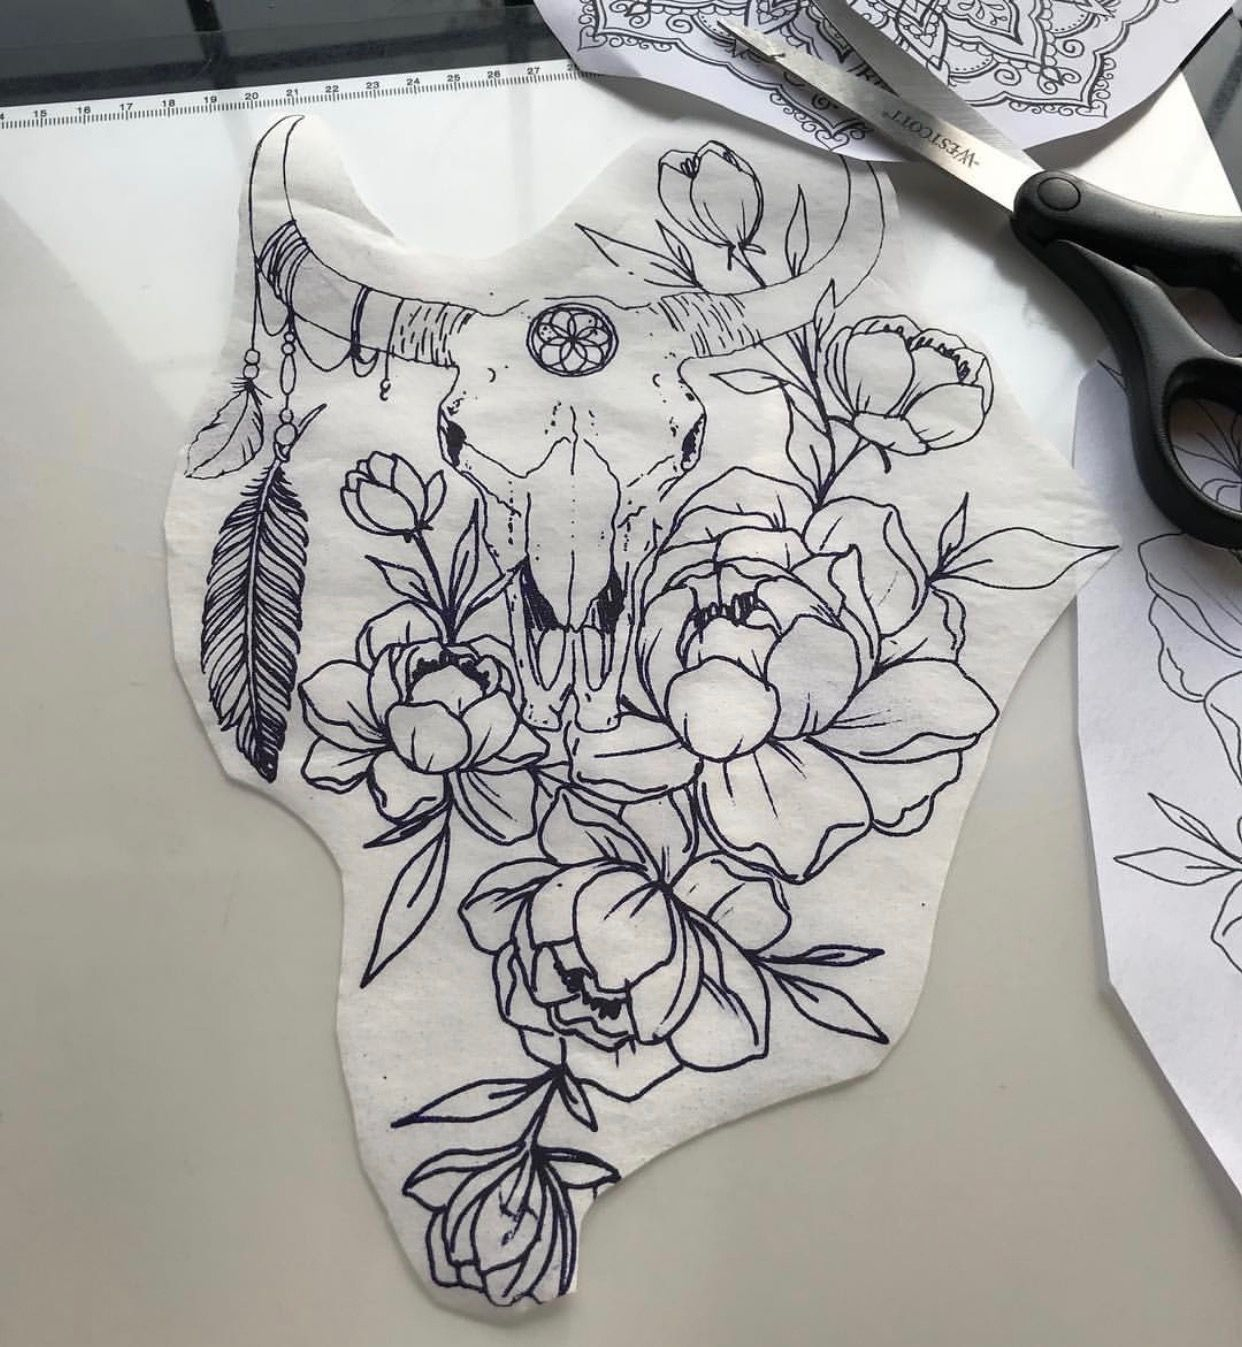 Body piercing needle  Pin by Mireya Palacios on tattoos  Pinterest  Tattoo Piercings